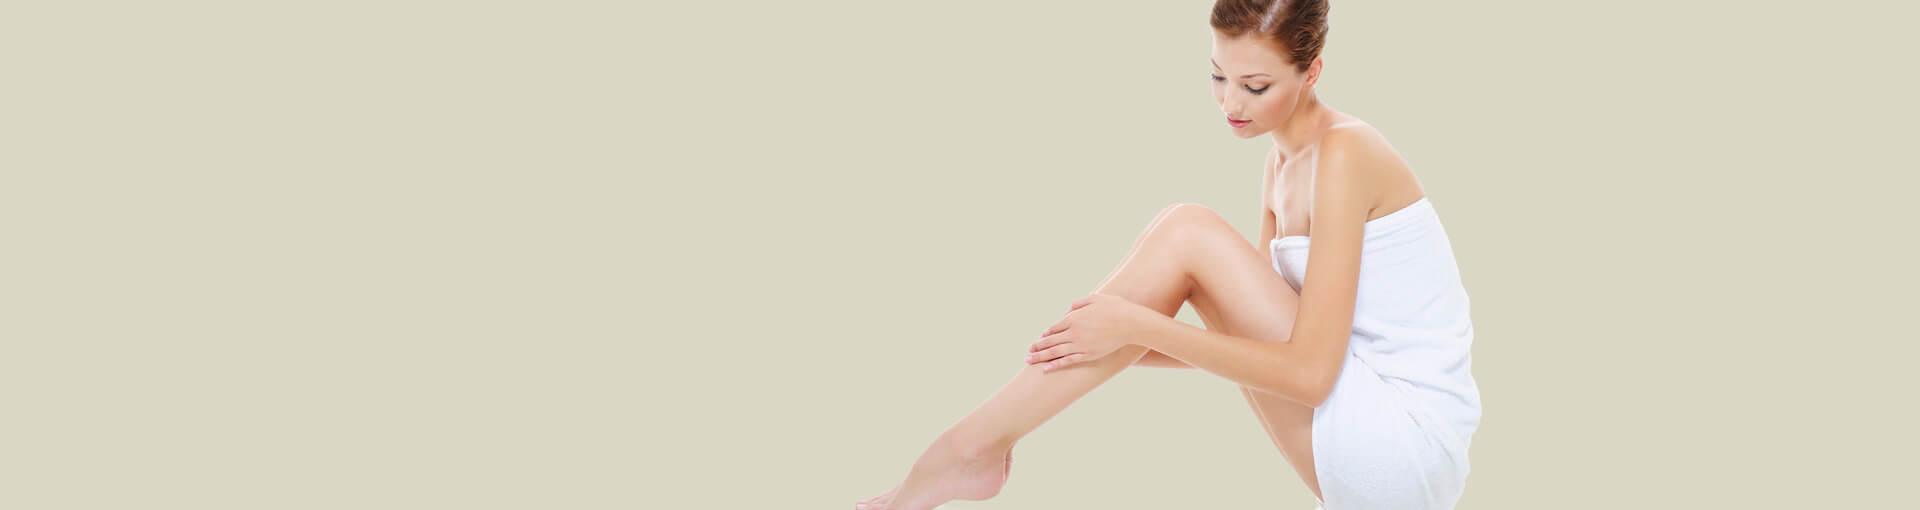 Skin Cancer - drs skin care